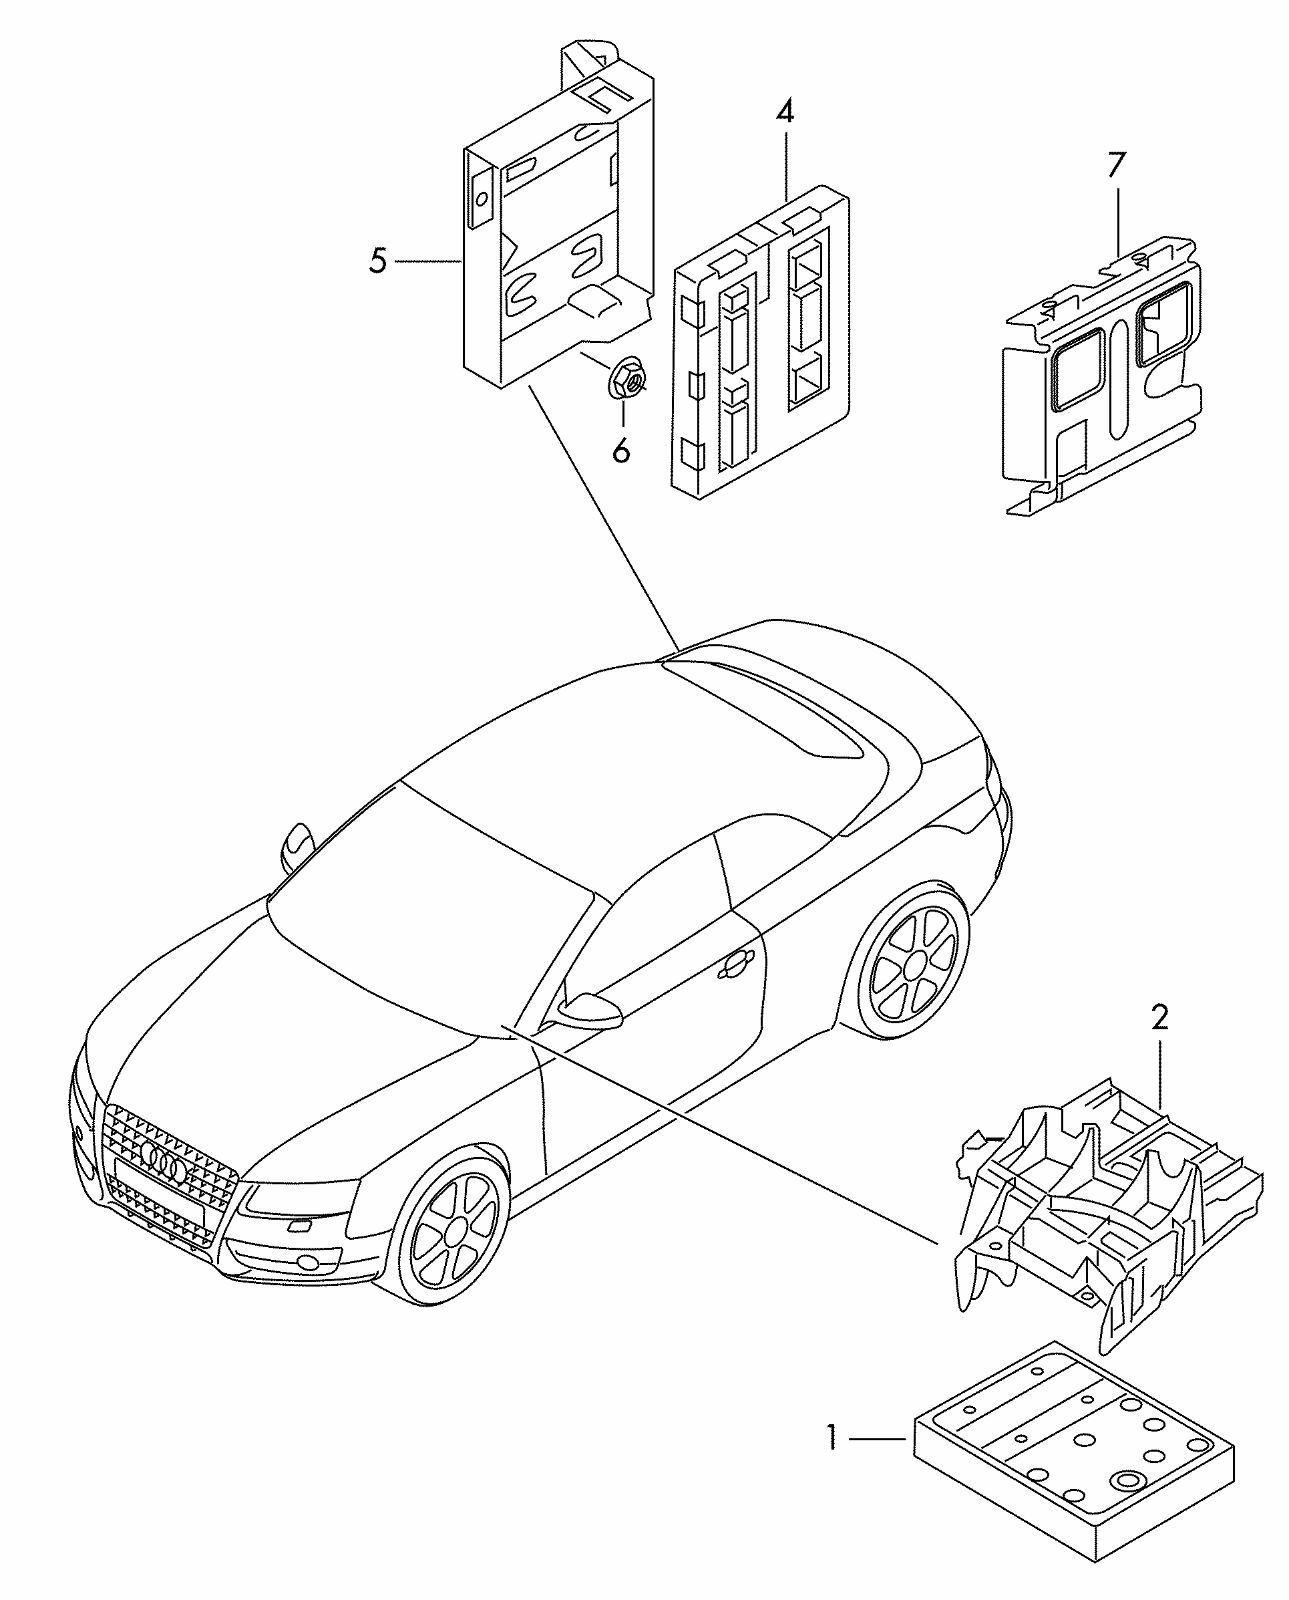 Oem for audi a4 body control module bcm 8t0 907 064 h bc rear unit 8t0907064h for sale